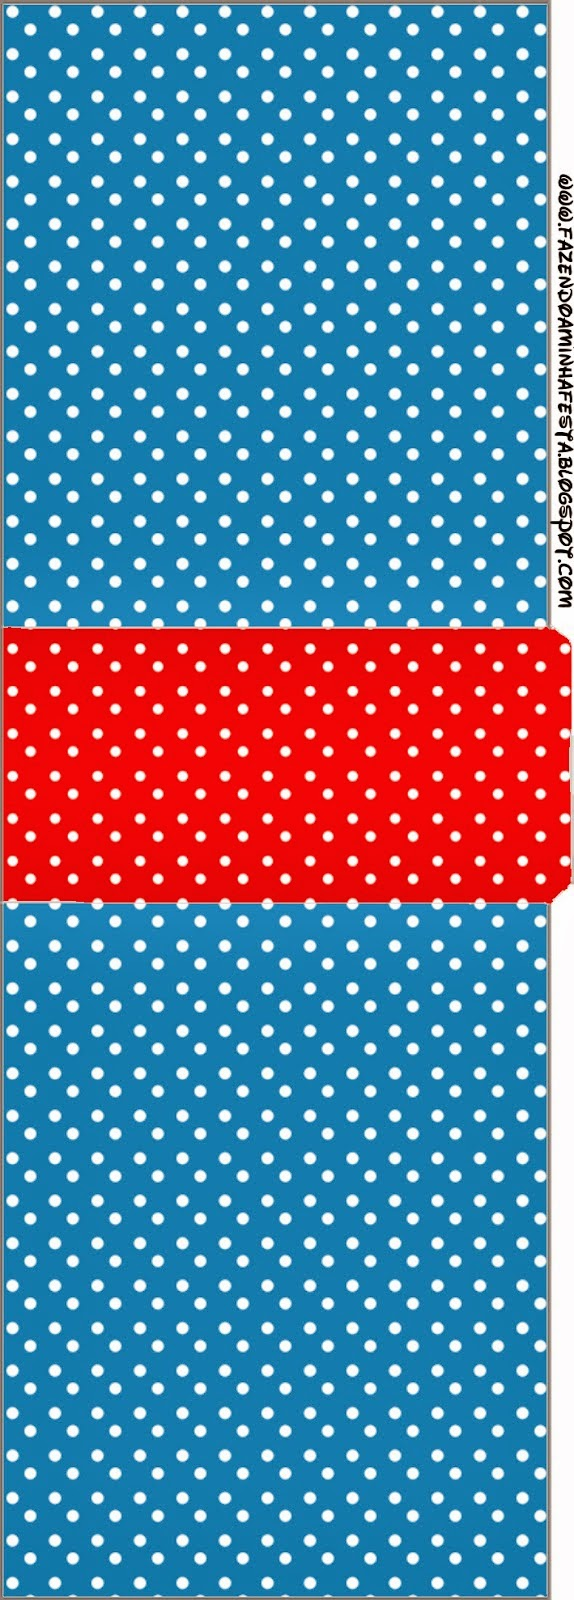 Etiqueta Tic Tac para imprimir gratis de Rojo, Amarillo y Azul.